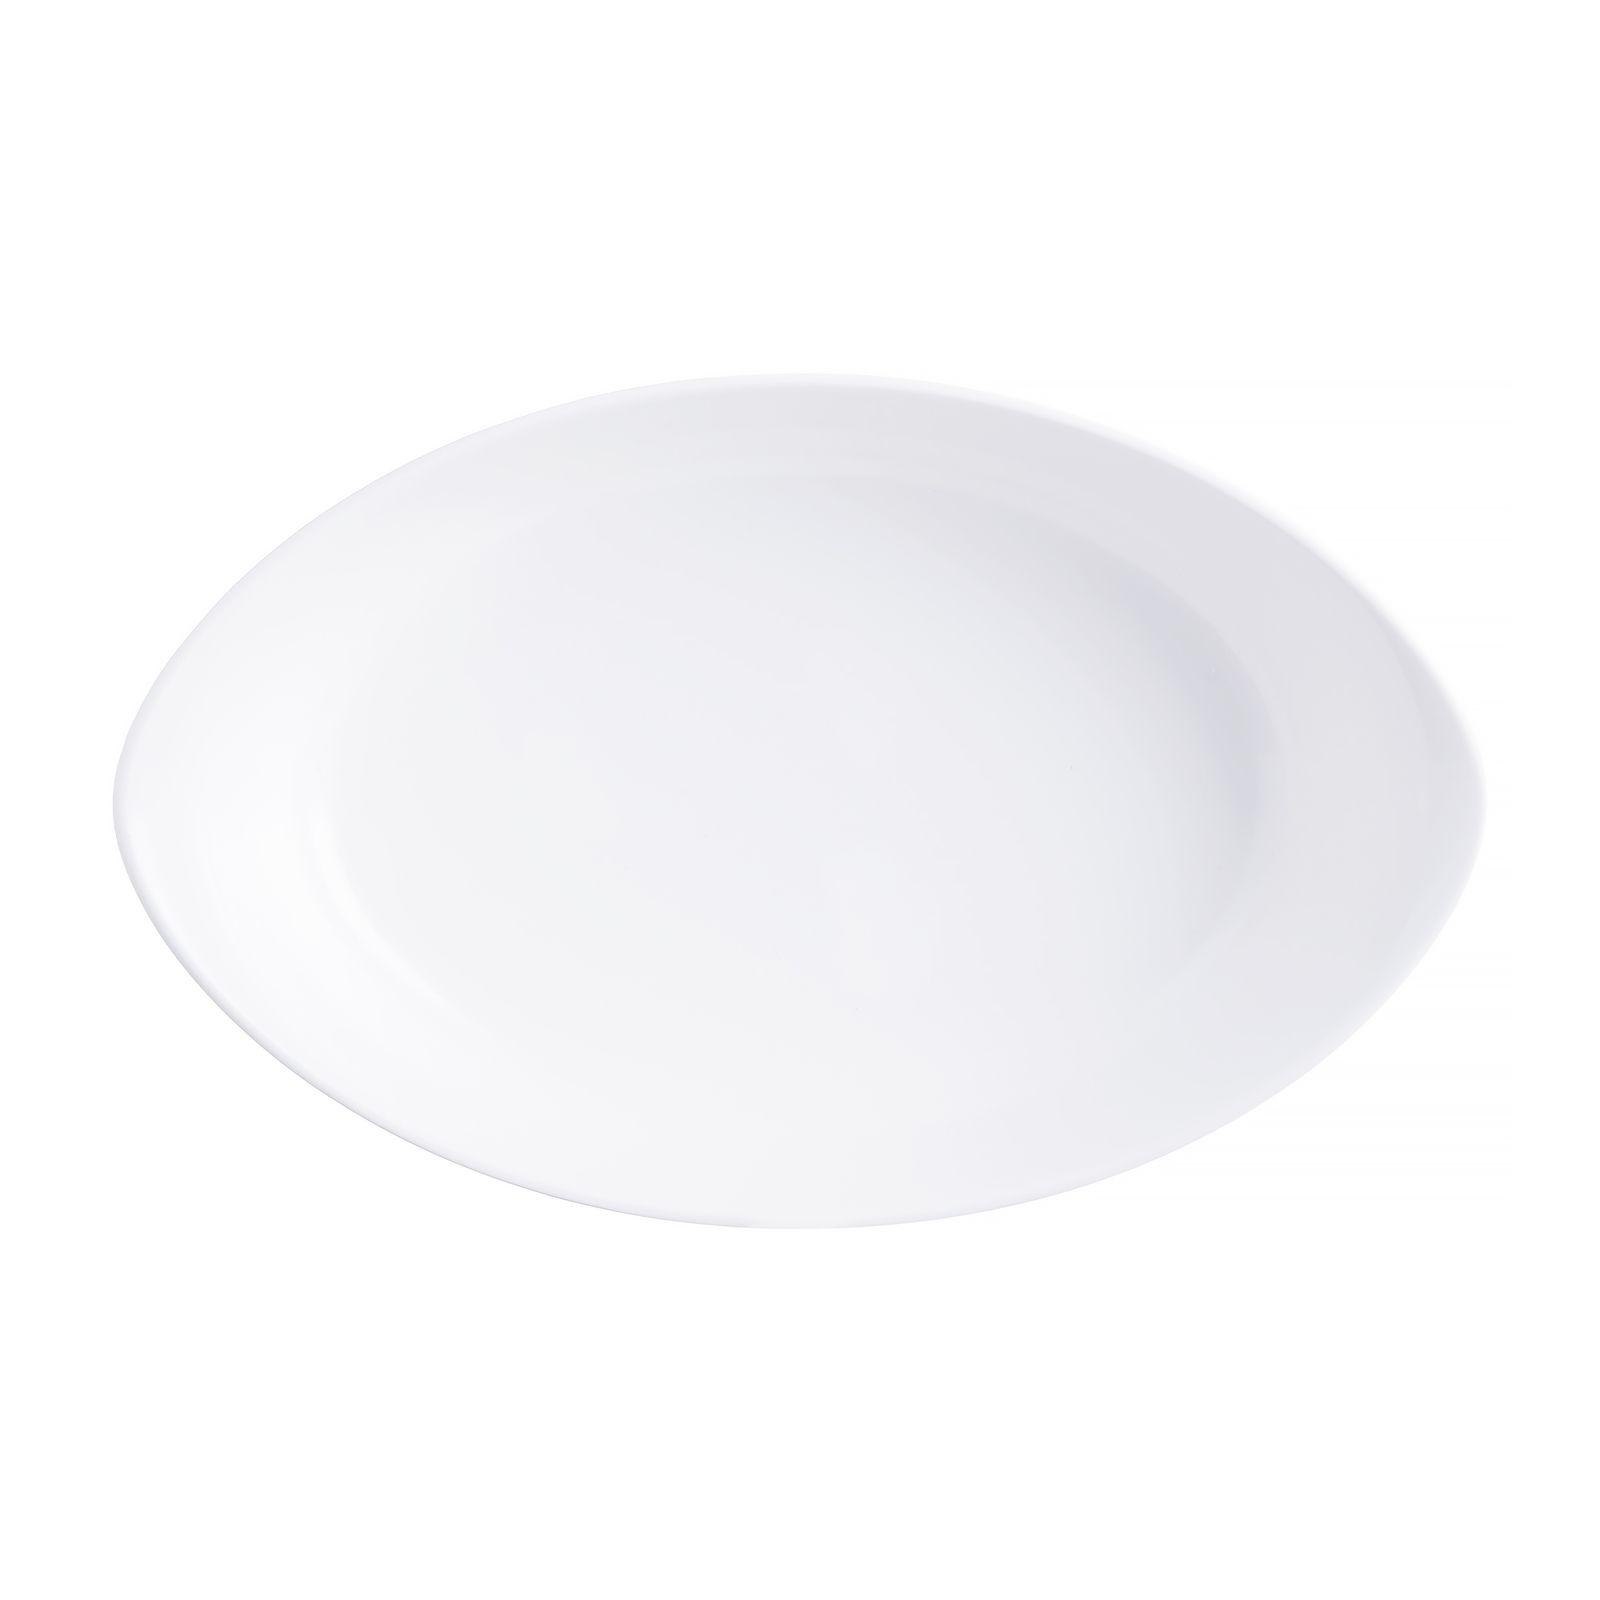 Ugnsform oval Smart Cuisine 25 x 15 cm LUMINARC